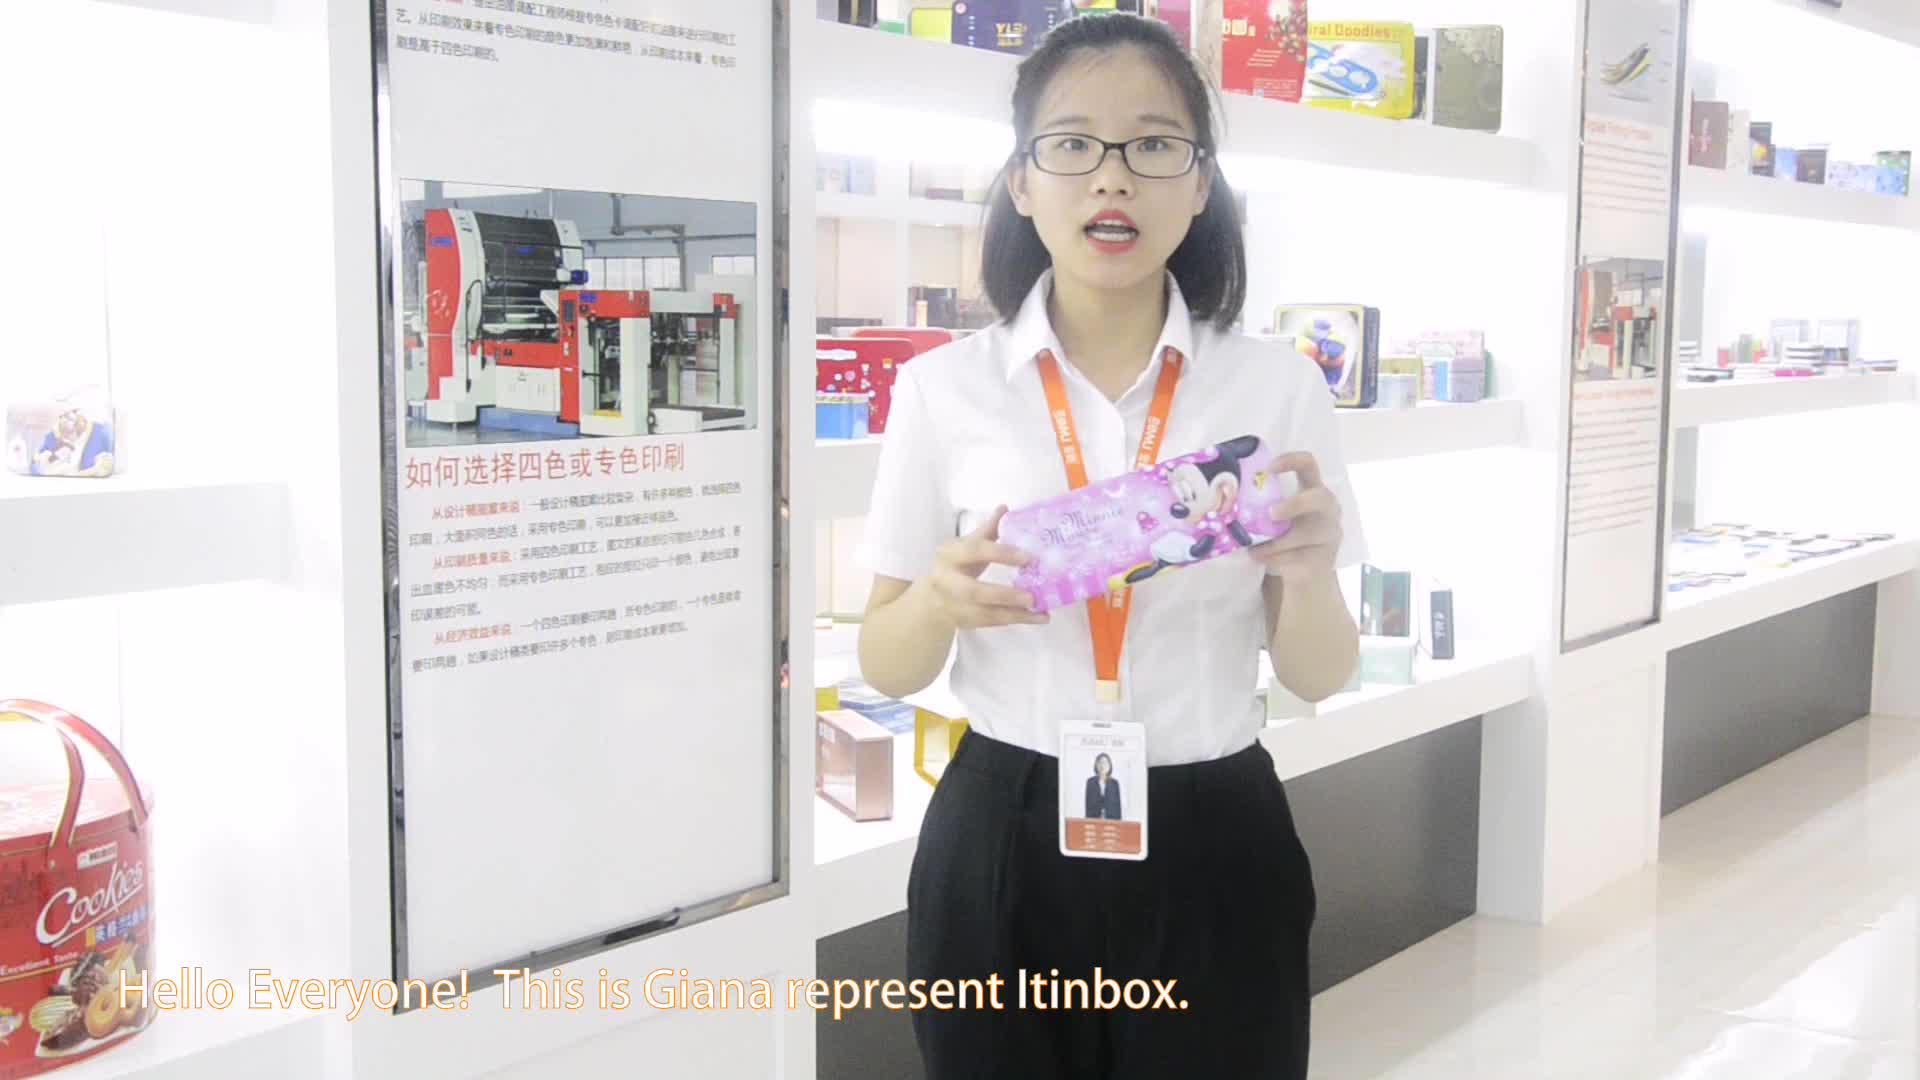 Itinbox คุณภาพสูงผู้ถือปากกาขายส่งพิมพ์กล่องดินสอโรงเรียนที่กำหนดเองดินสอผู้ผลิต